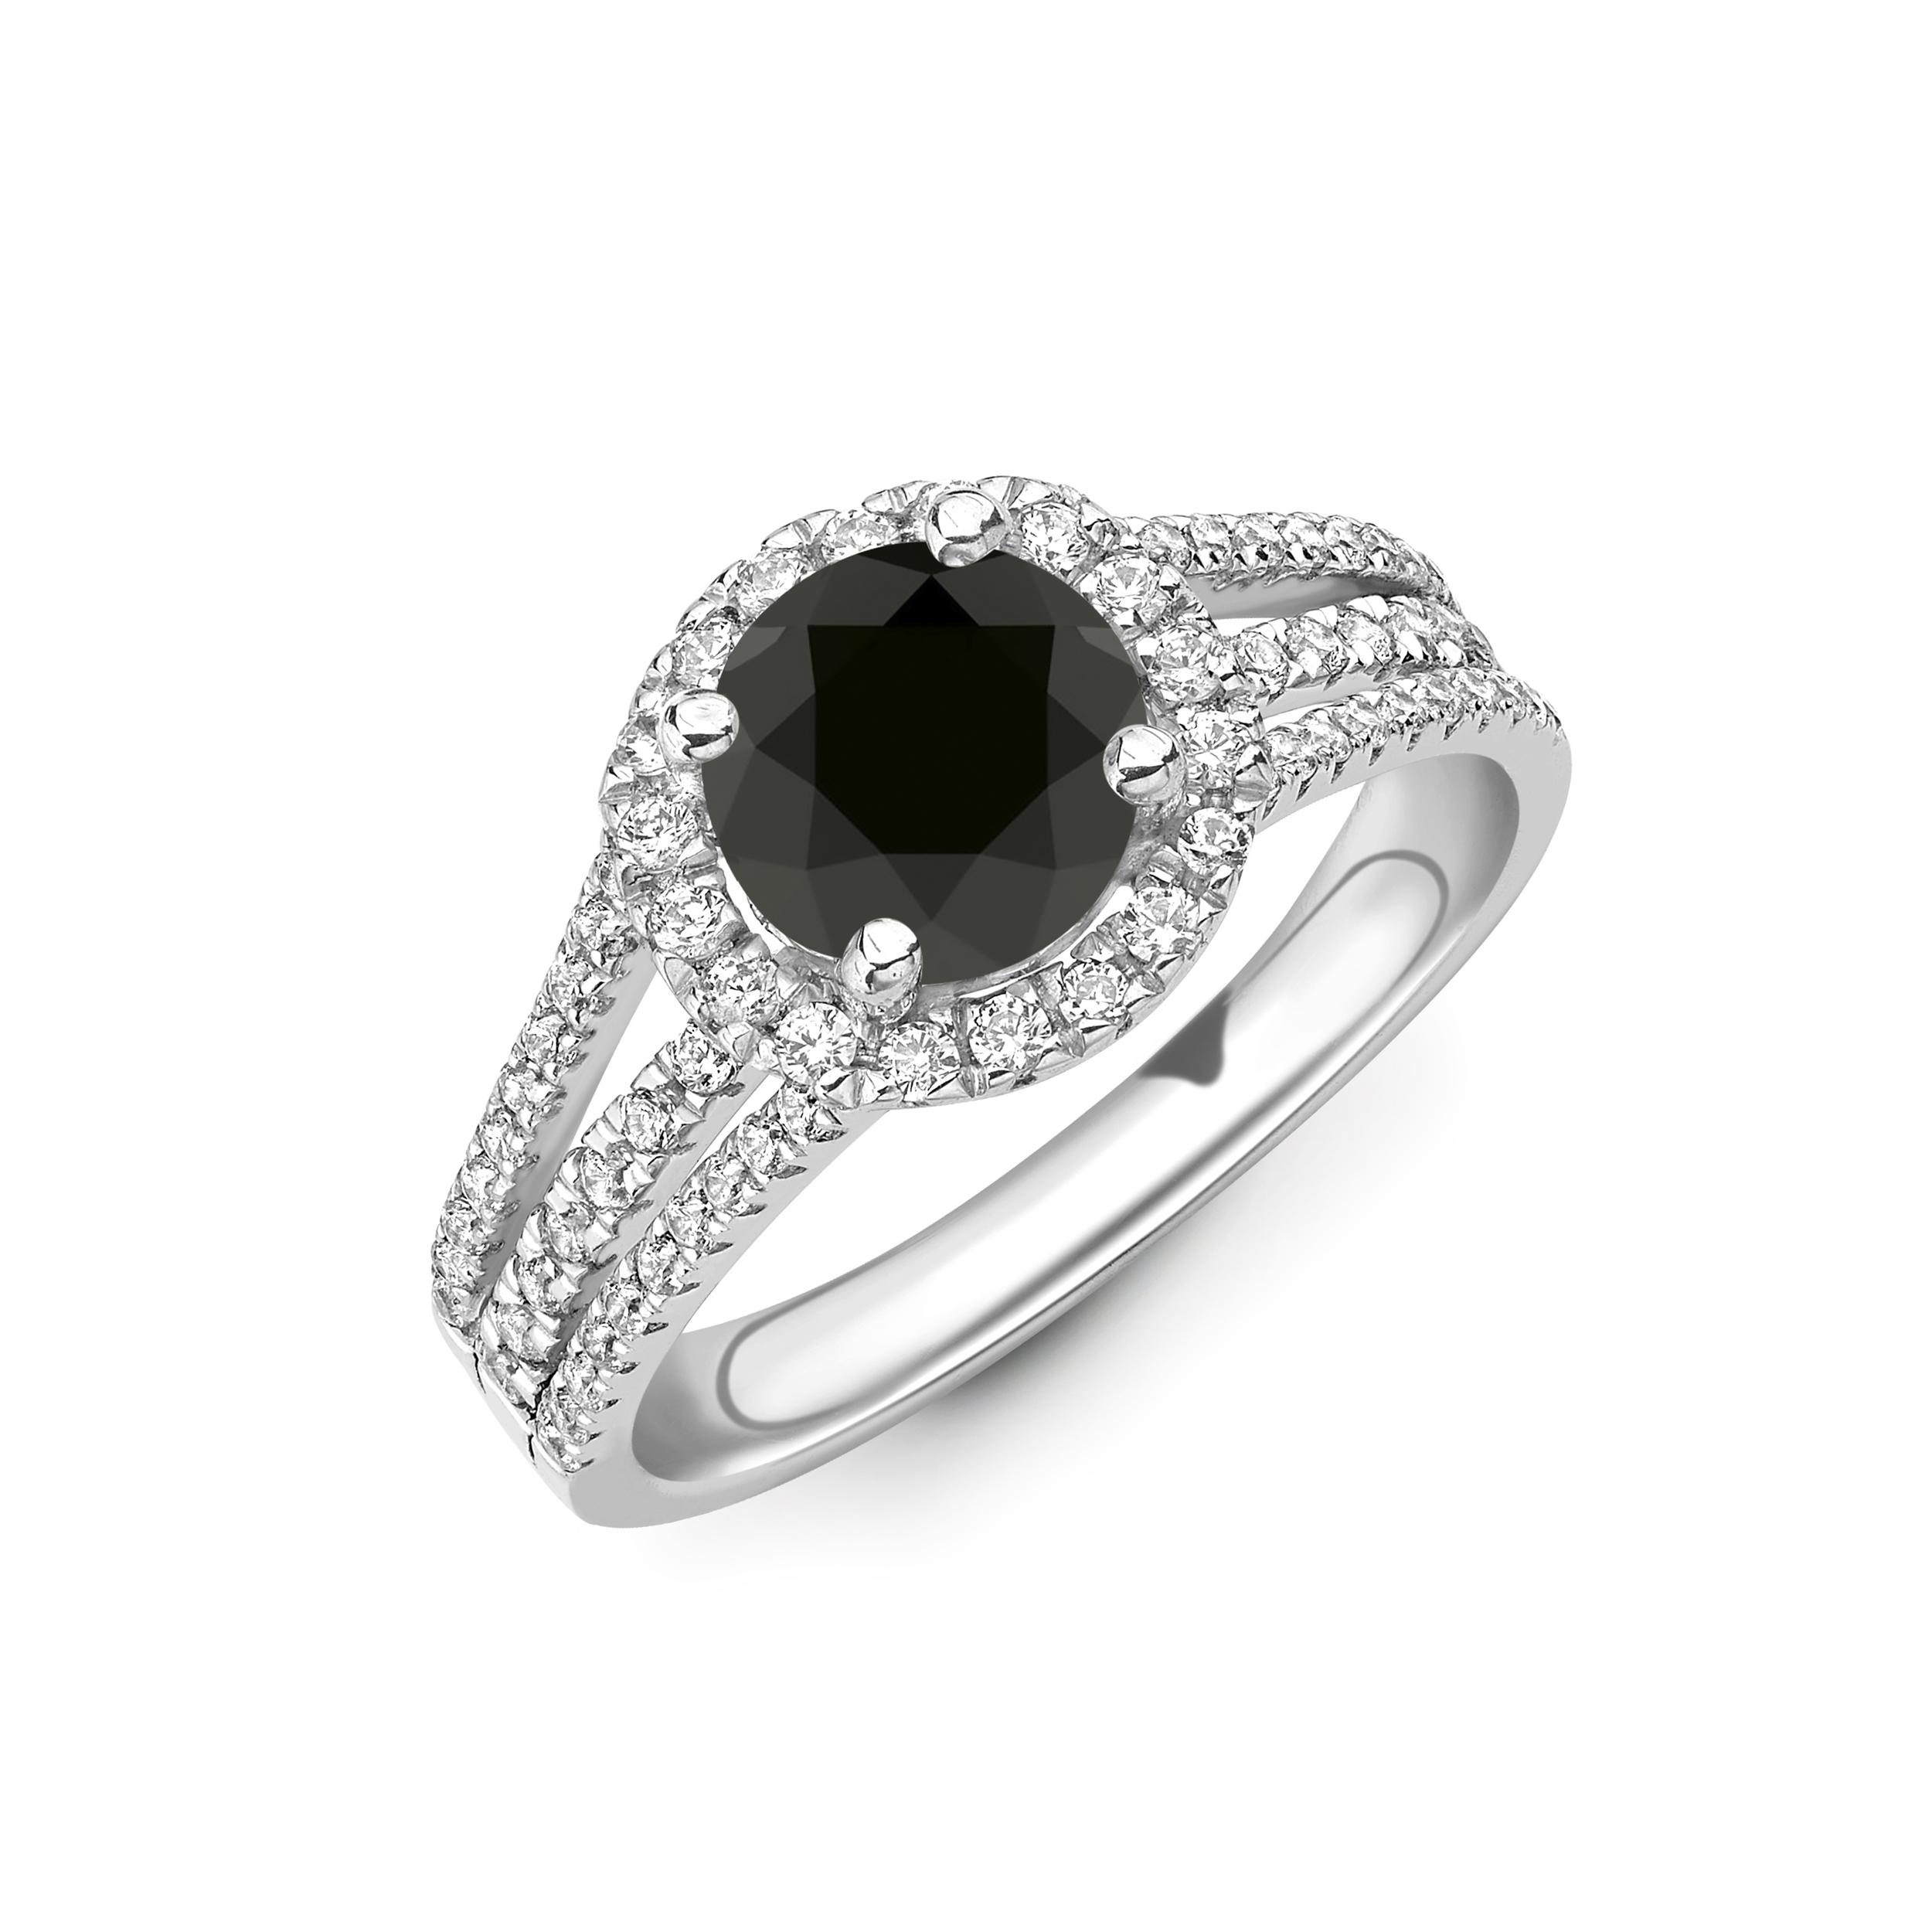 Stacking Style 3 Raw Band Halo Black Diamond Engagement Rings